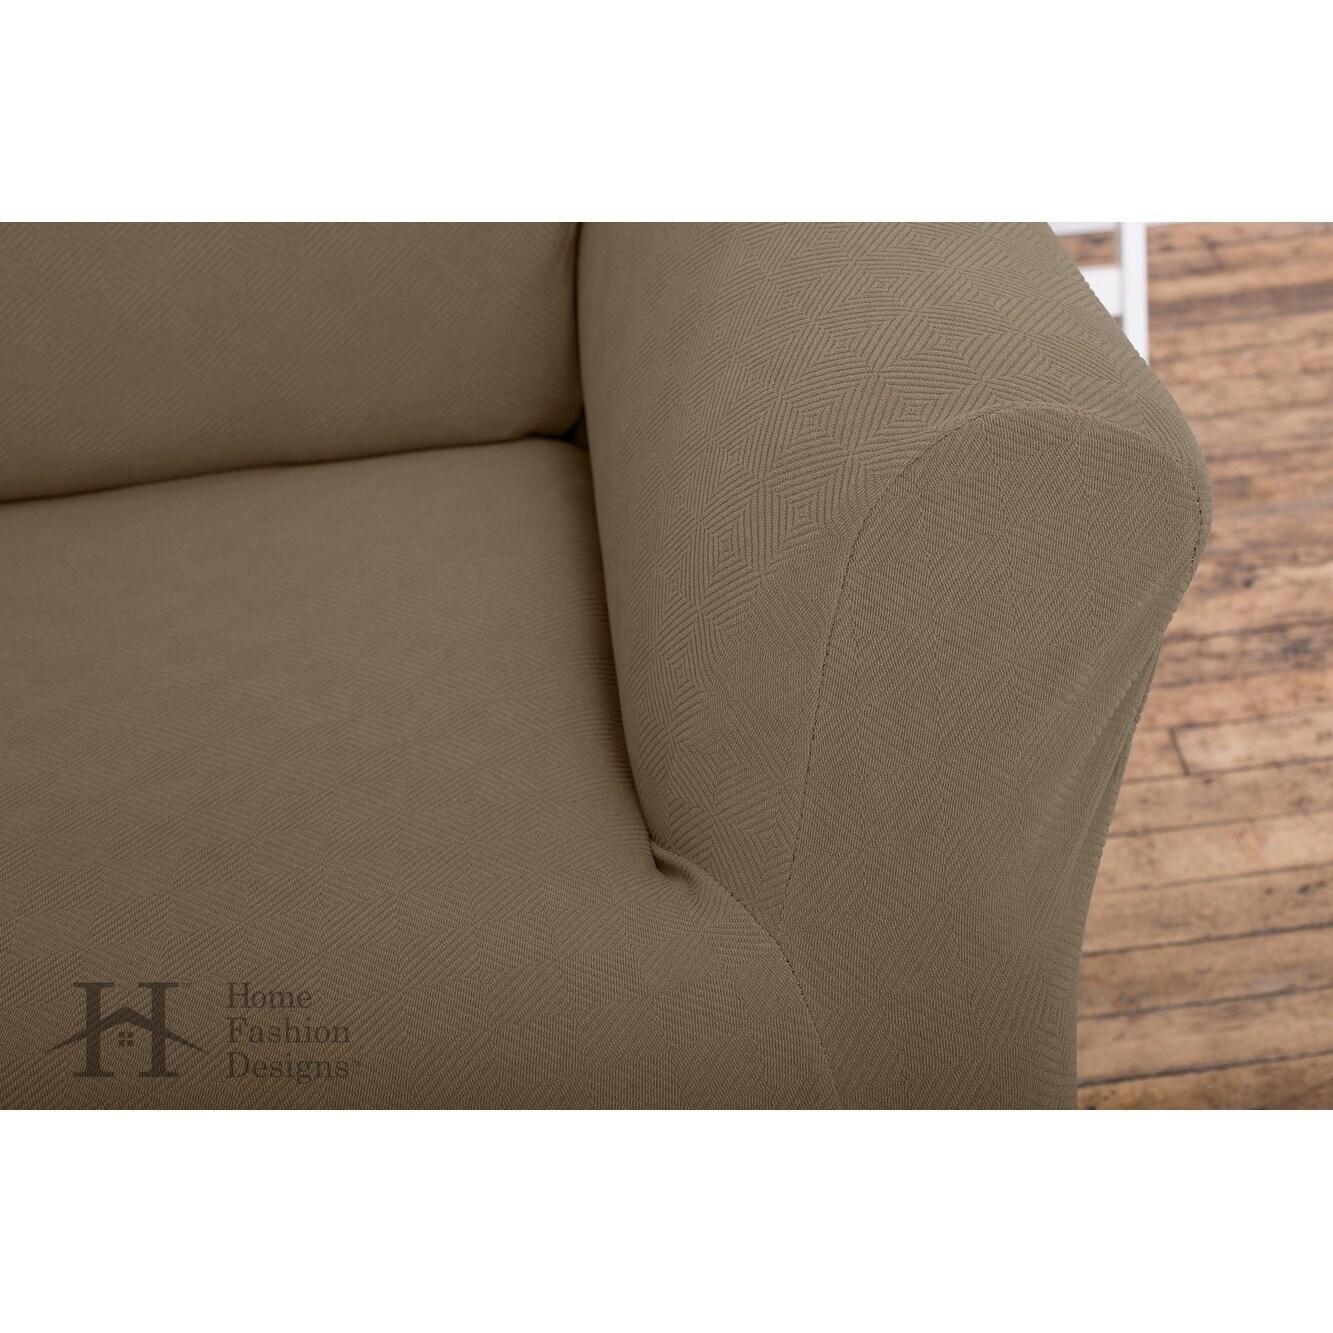 Cambria Collection Heavyweight Stretch Sofa Slipcover